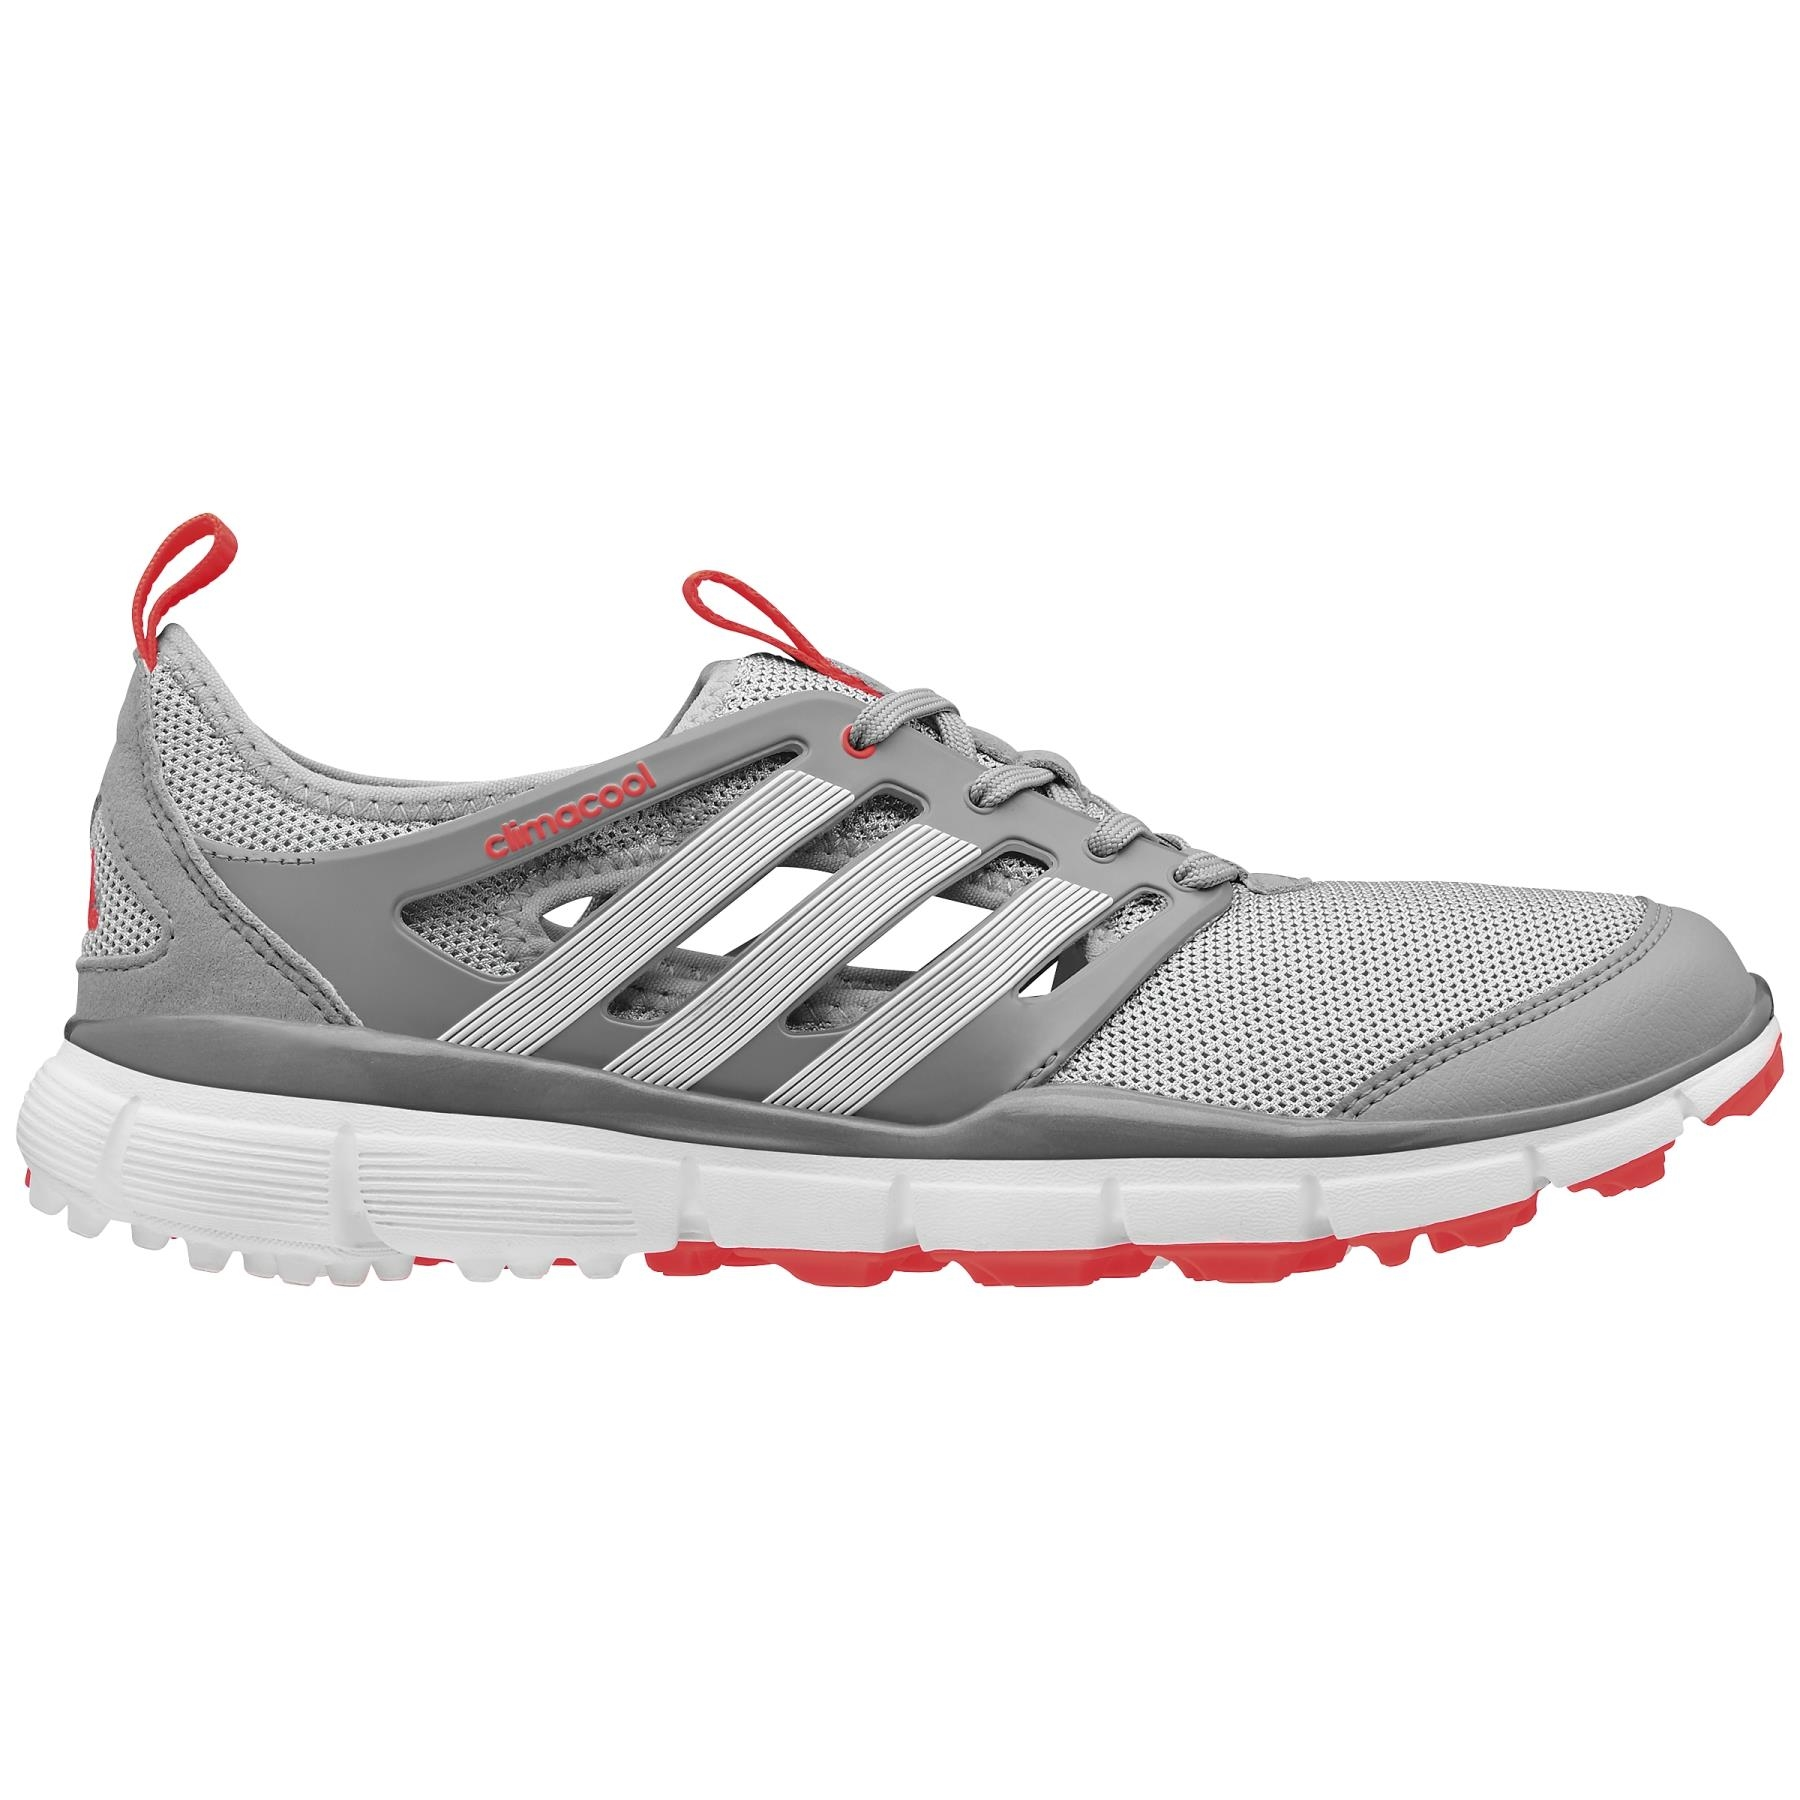 Adidas Climacool Ii Ladies Shoe